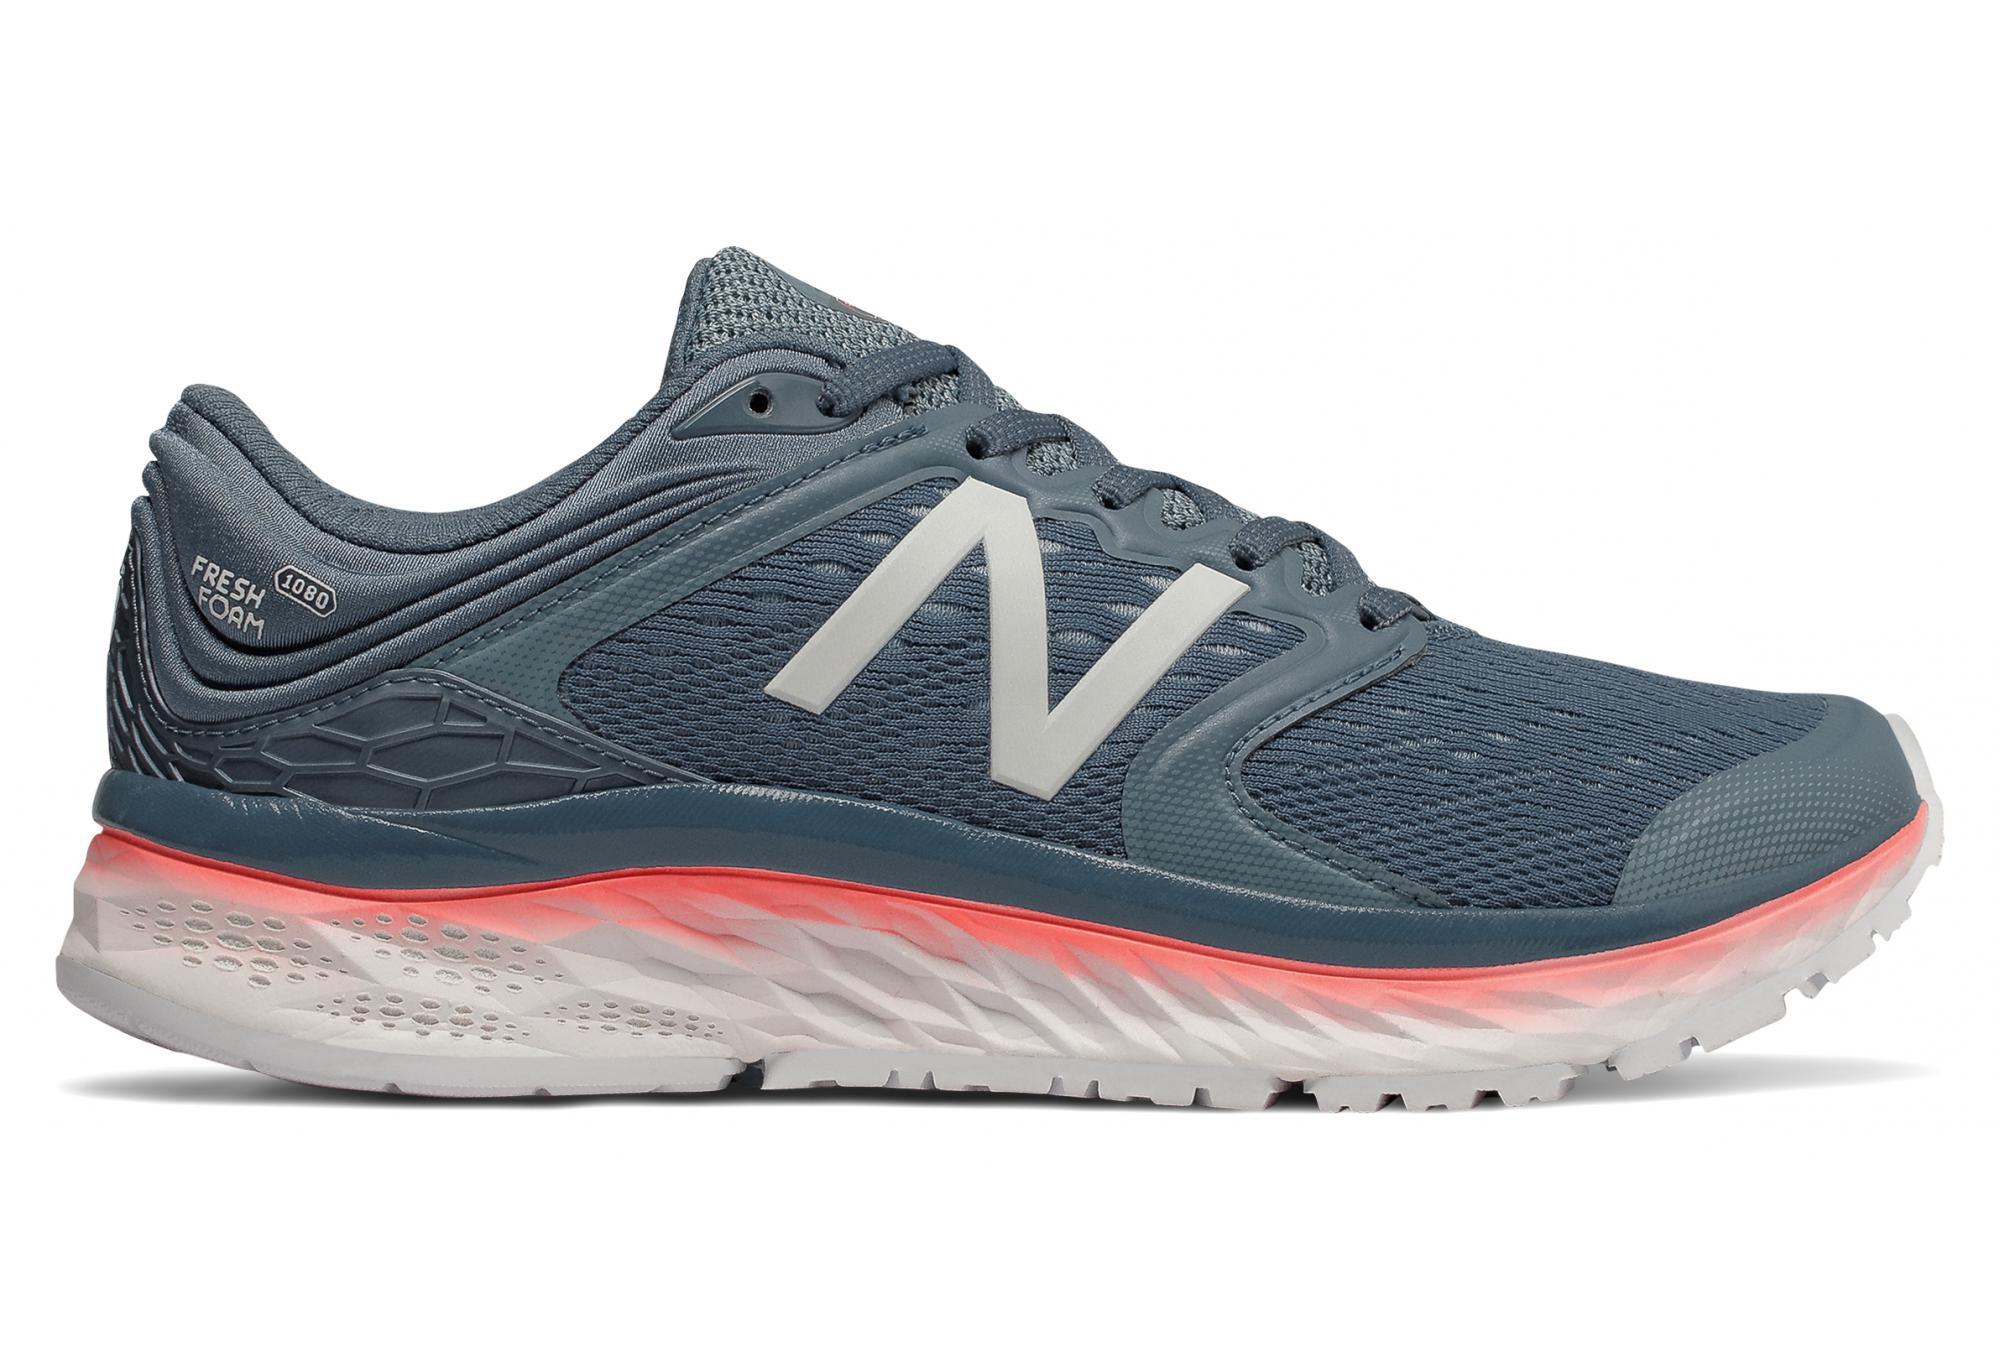 Zapatillas New Balance Fresh Foam 1080 V8 Azul Rosa para Mujer